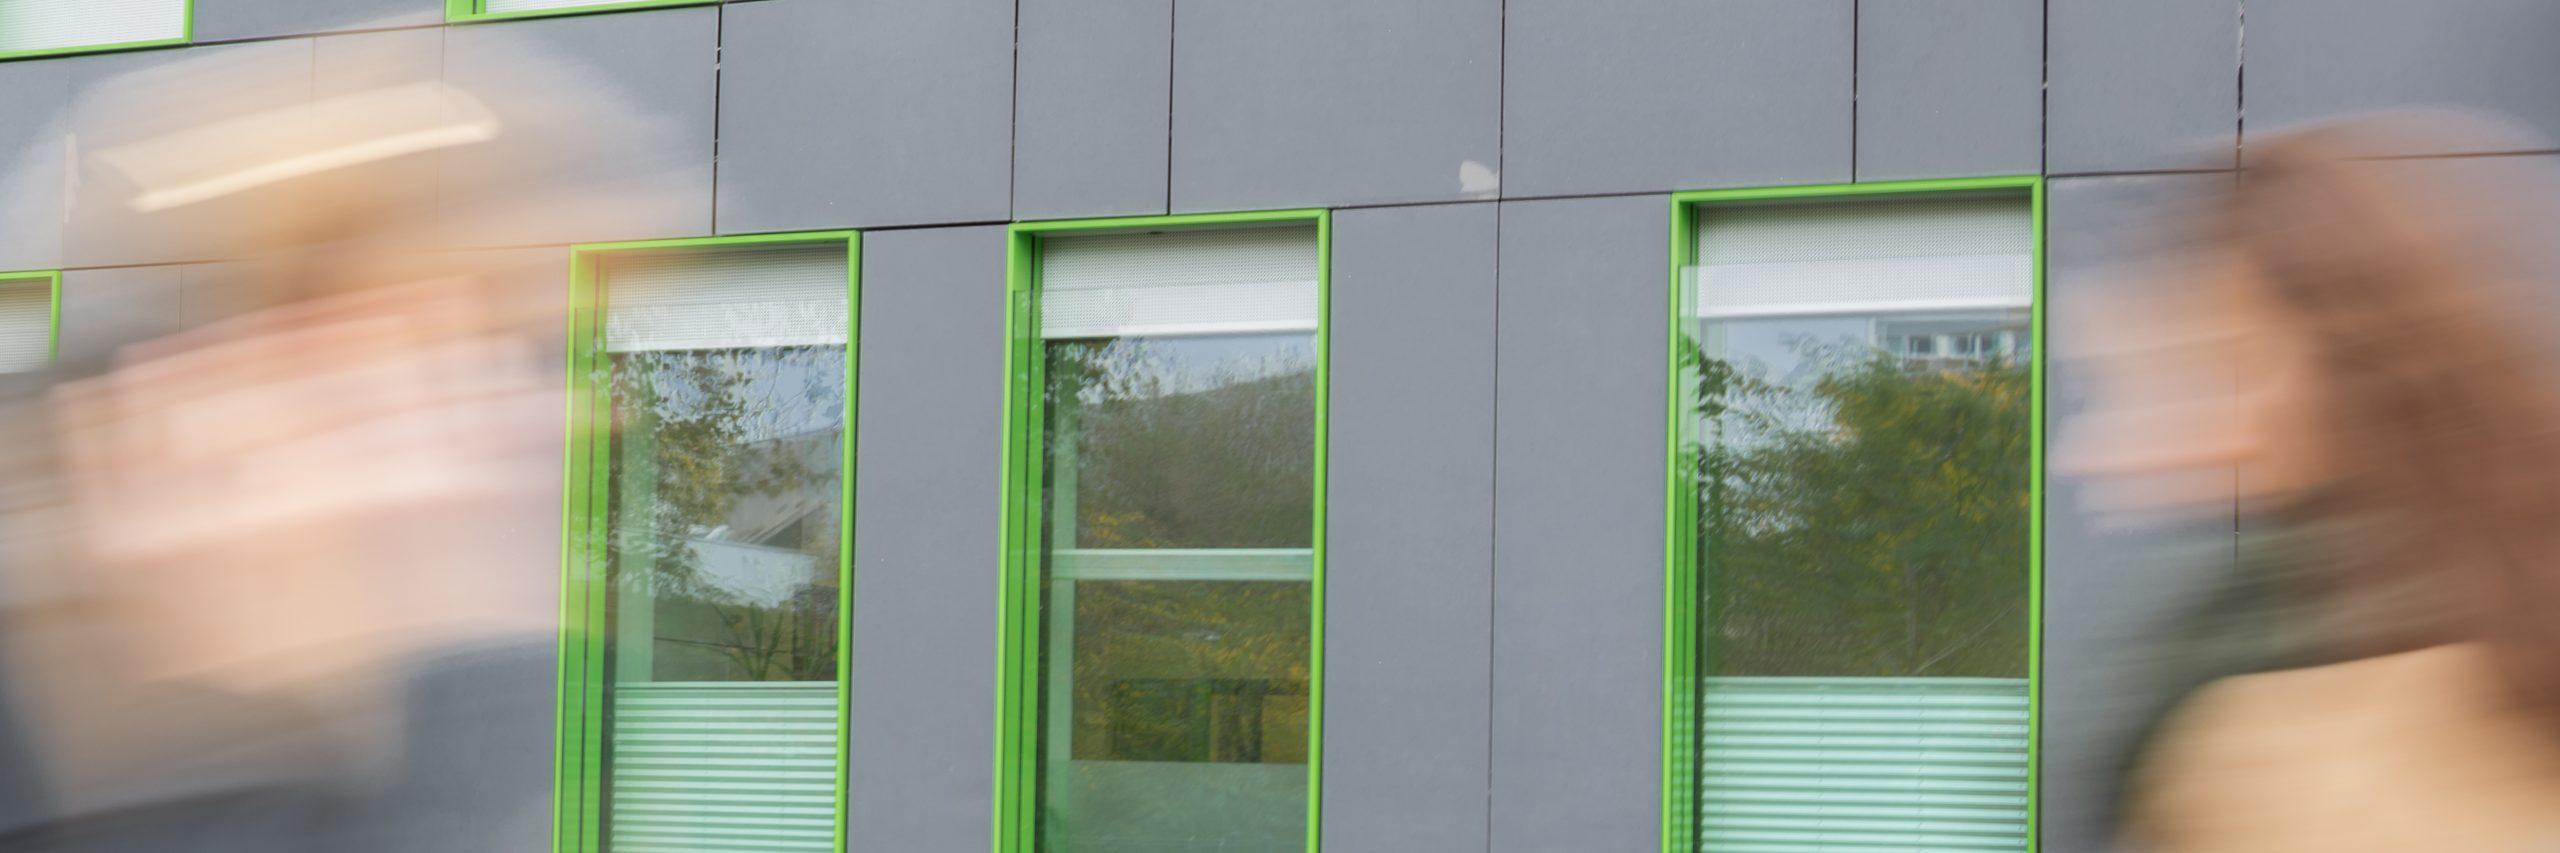 Hochhaus; Bürogebäude; Schatten; Menschen; Corporate Social Responsibility